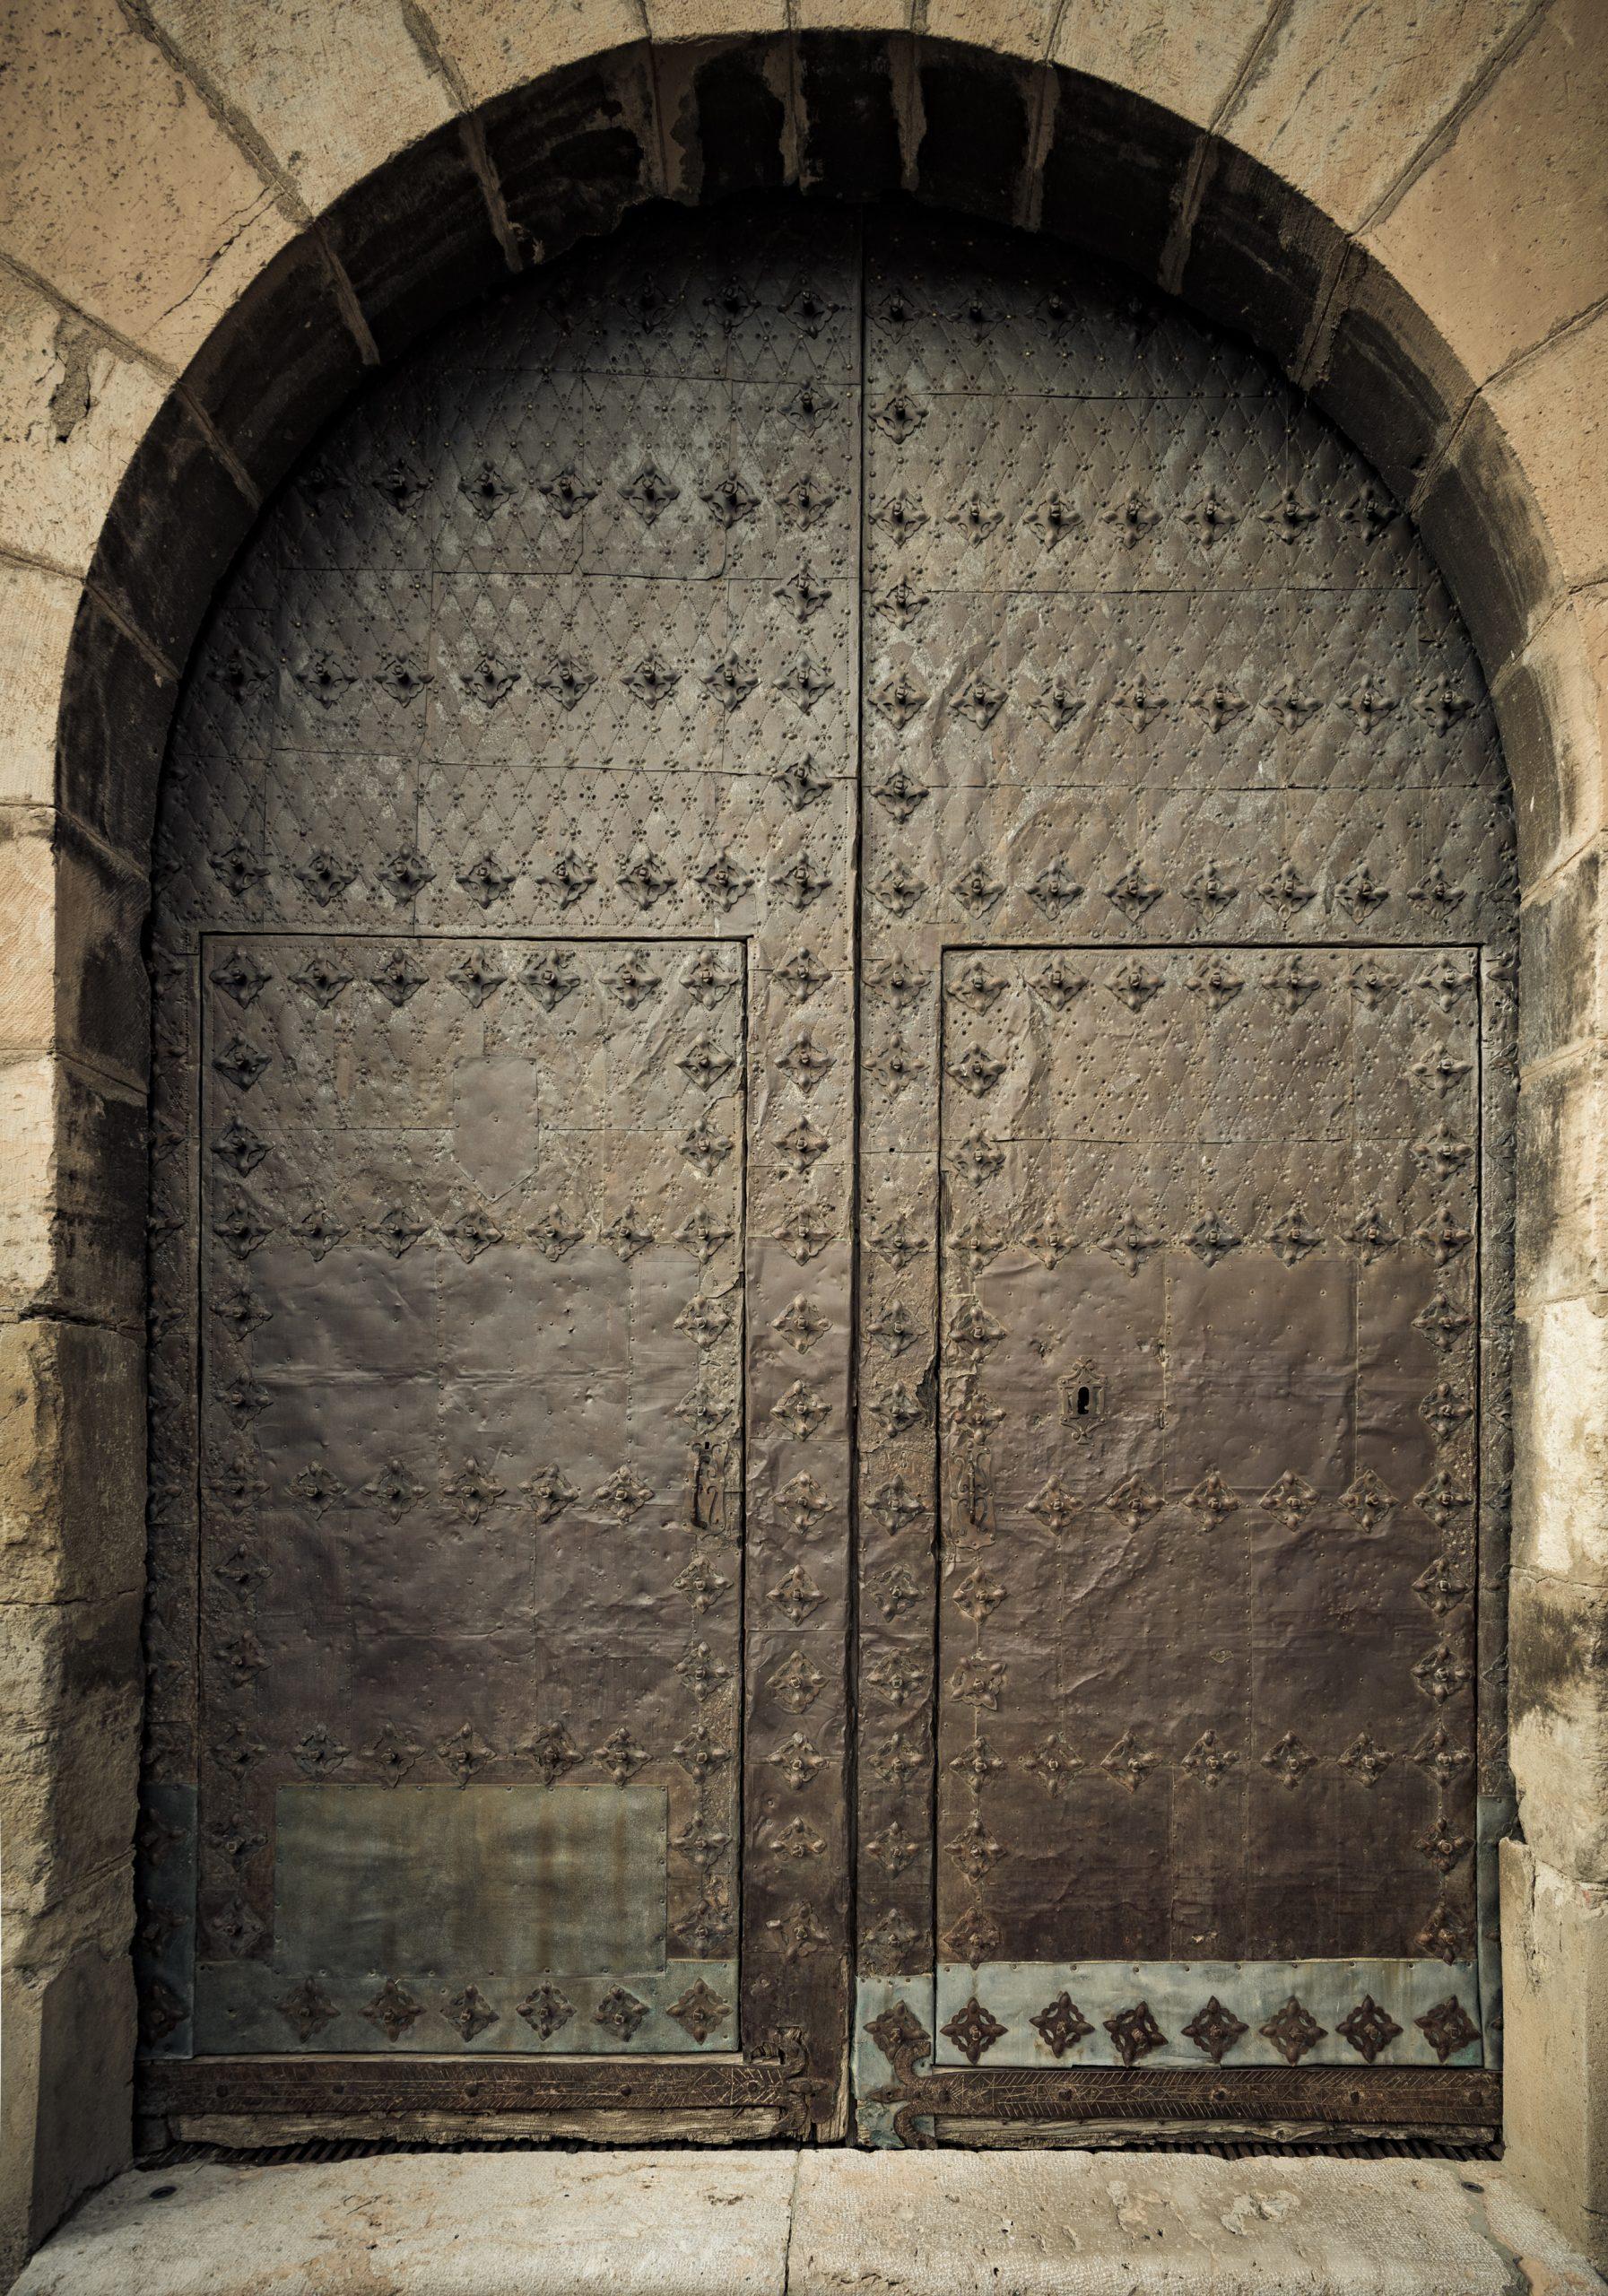 Old iron door in a medieval building